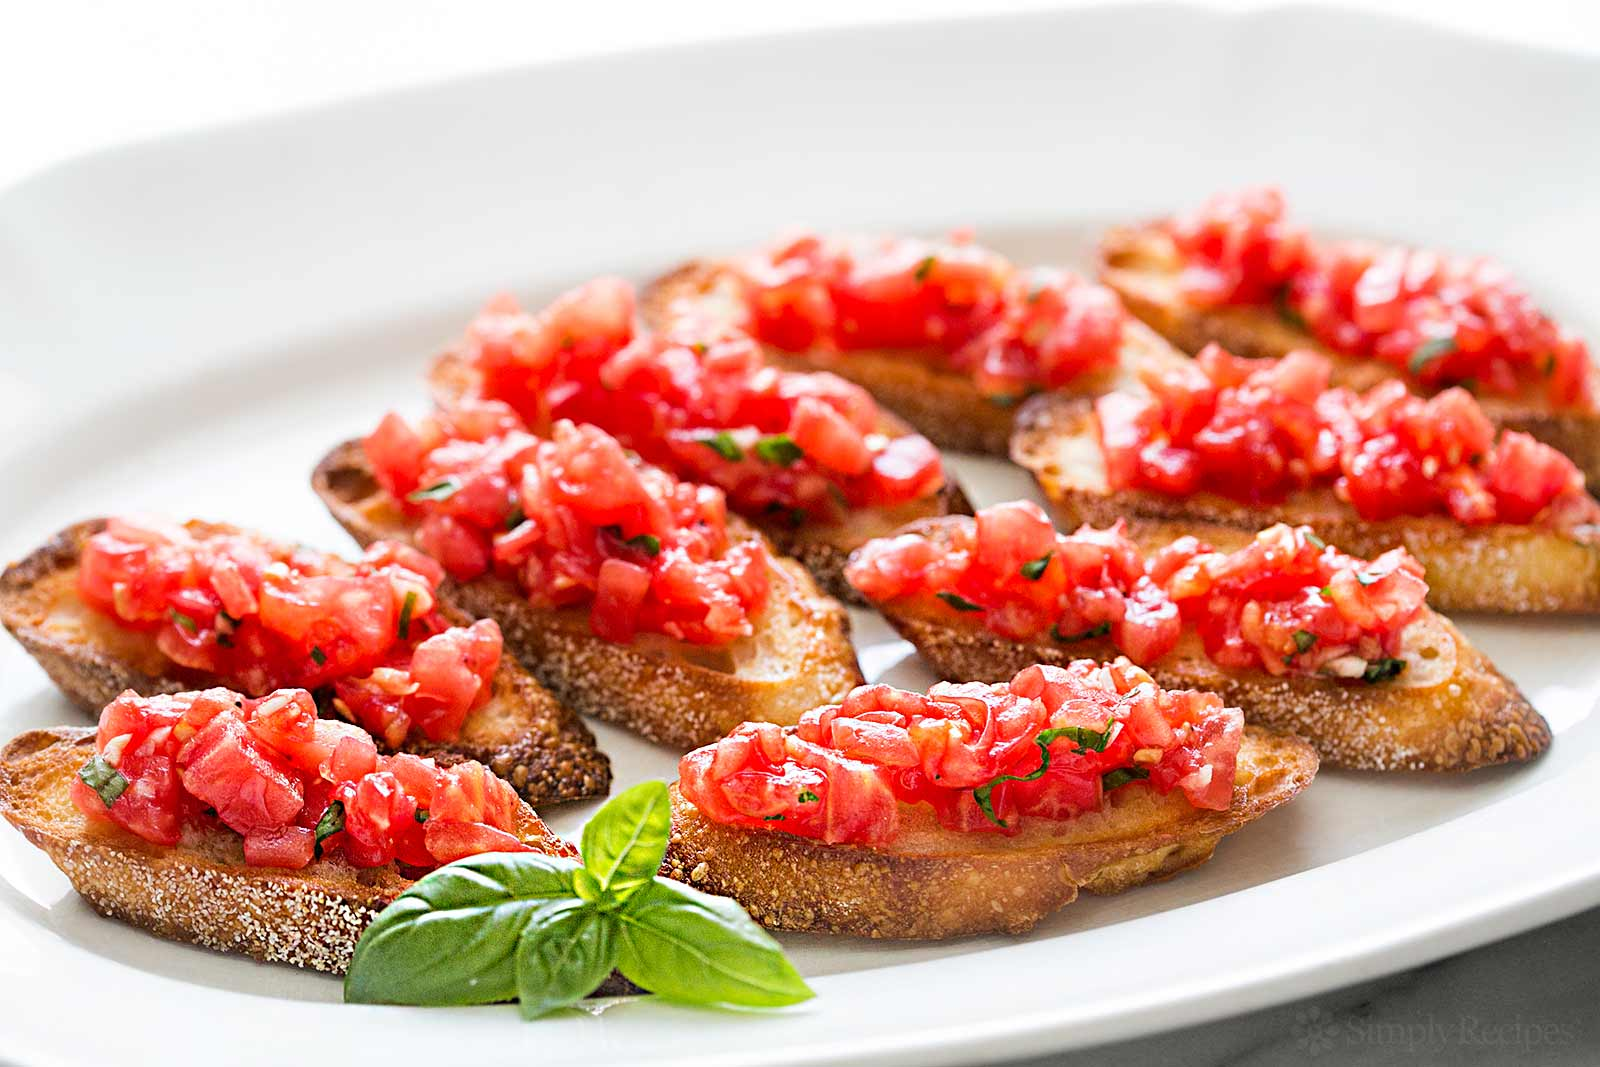 bruschetta-tomato-basil-horiz-a-1600.jpg